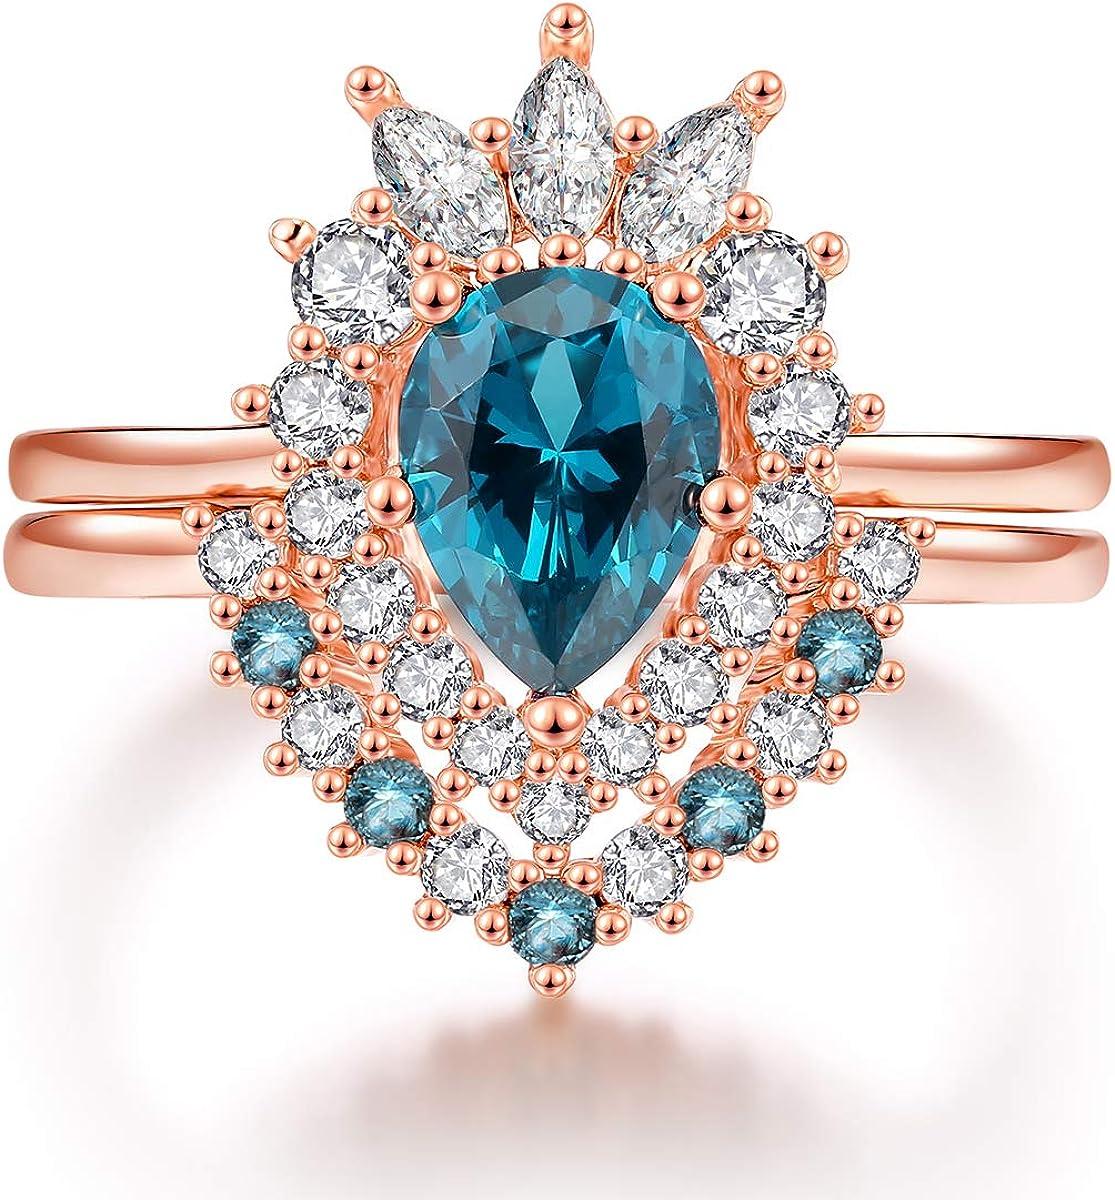 JIANGYUE 18K Rose Gold Pear Shape Mint Green Princess Crown Rings for Women Promise Wedding Bands Cubic Zirconia Gemstone Bridal Rings Set Size 5-10 (Green)